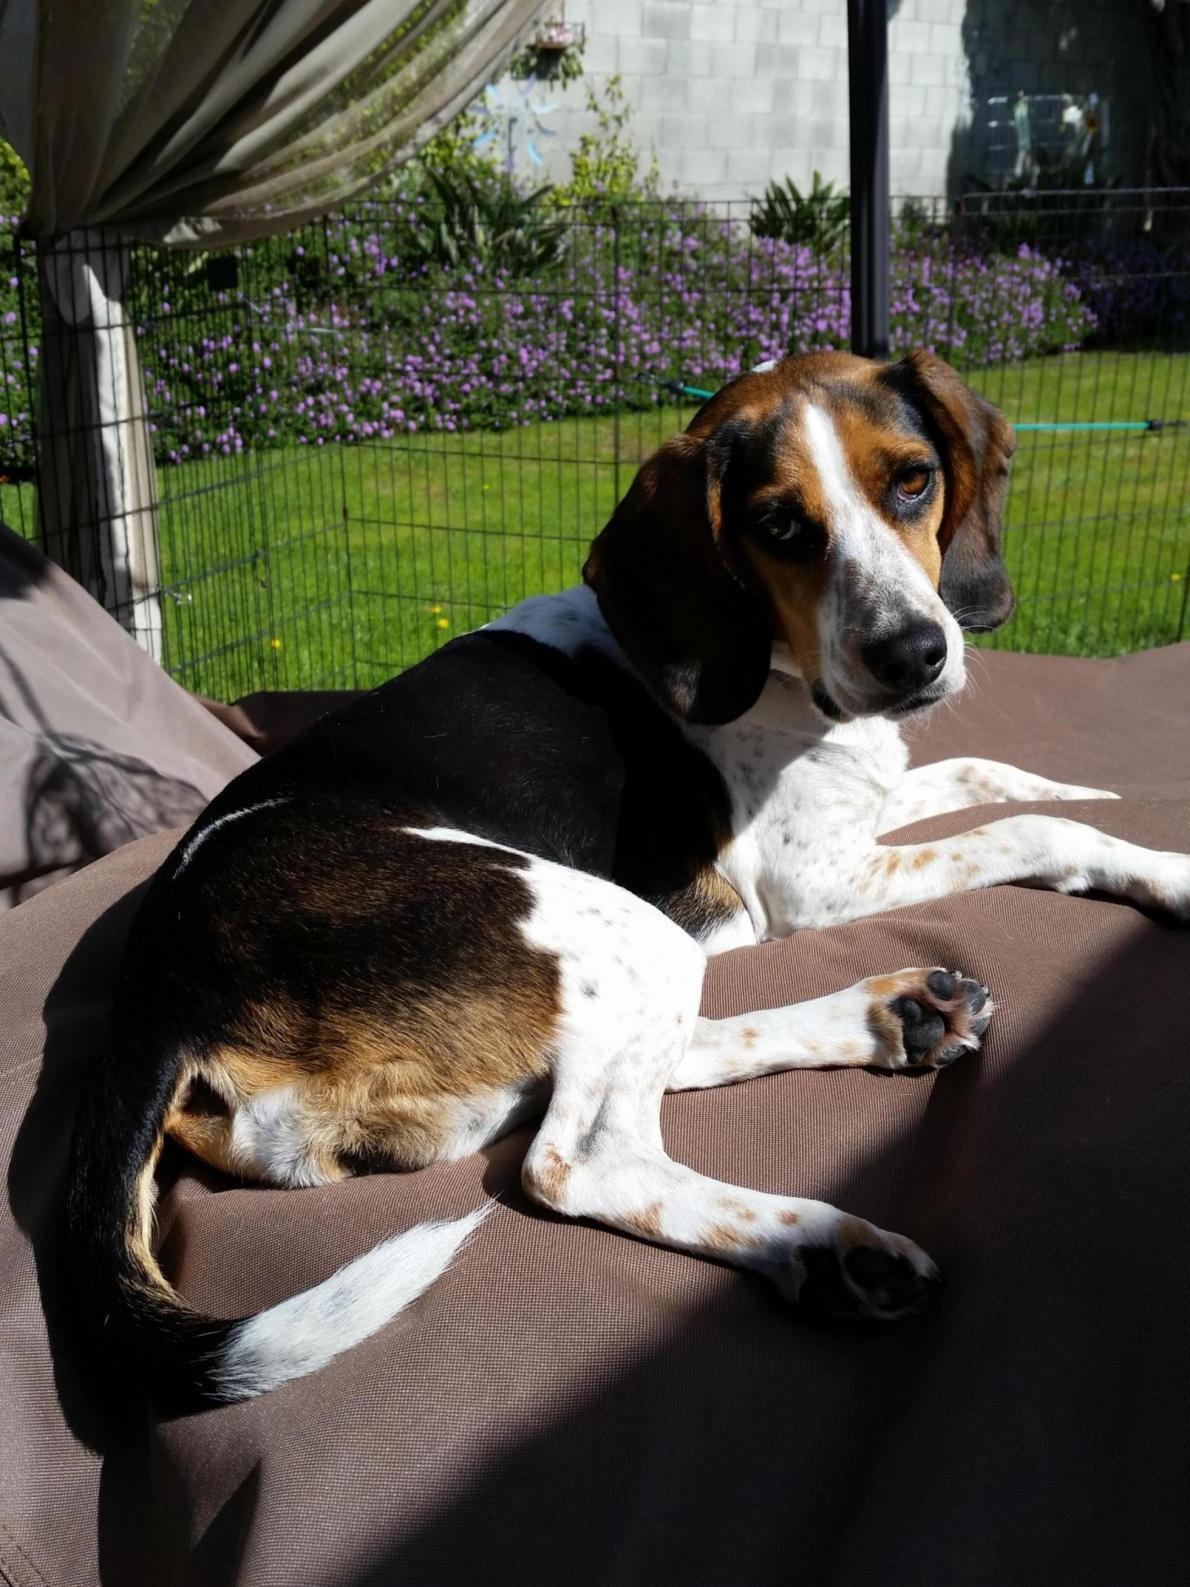 Boast about your Beagle-20160410_095720_1565140225720.jpg